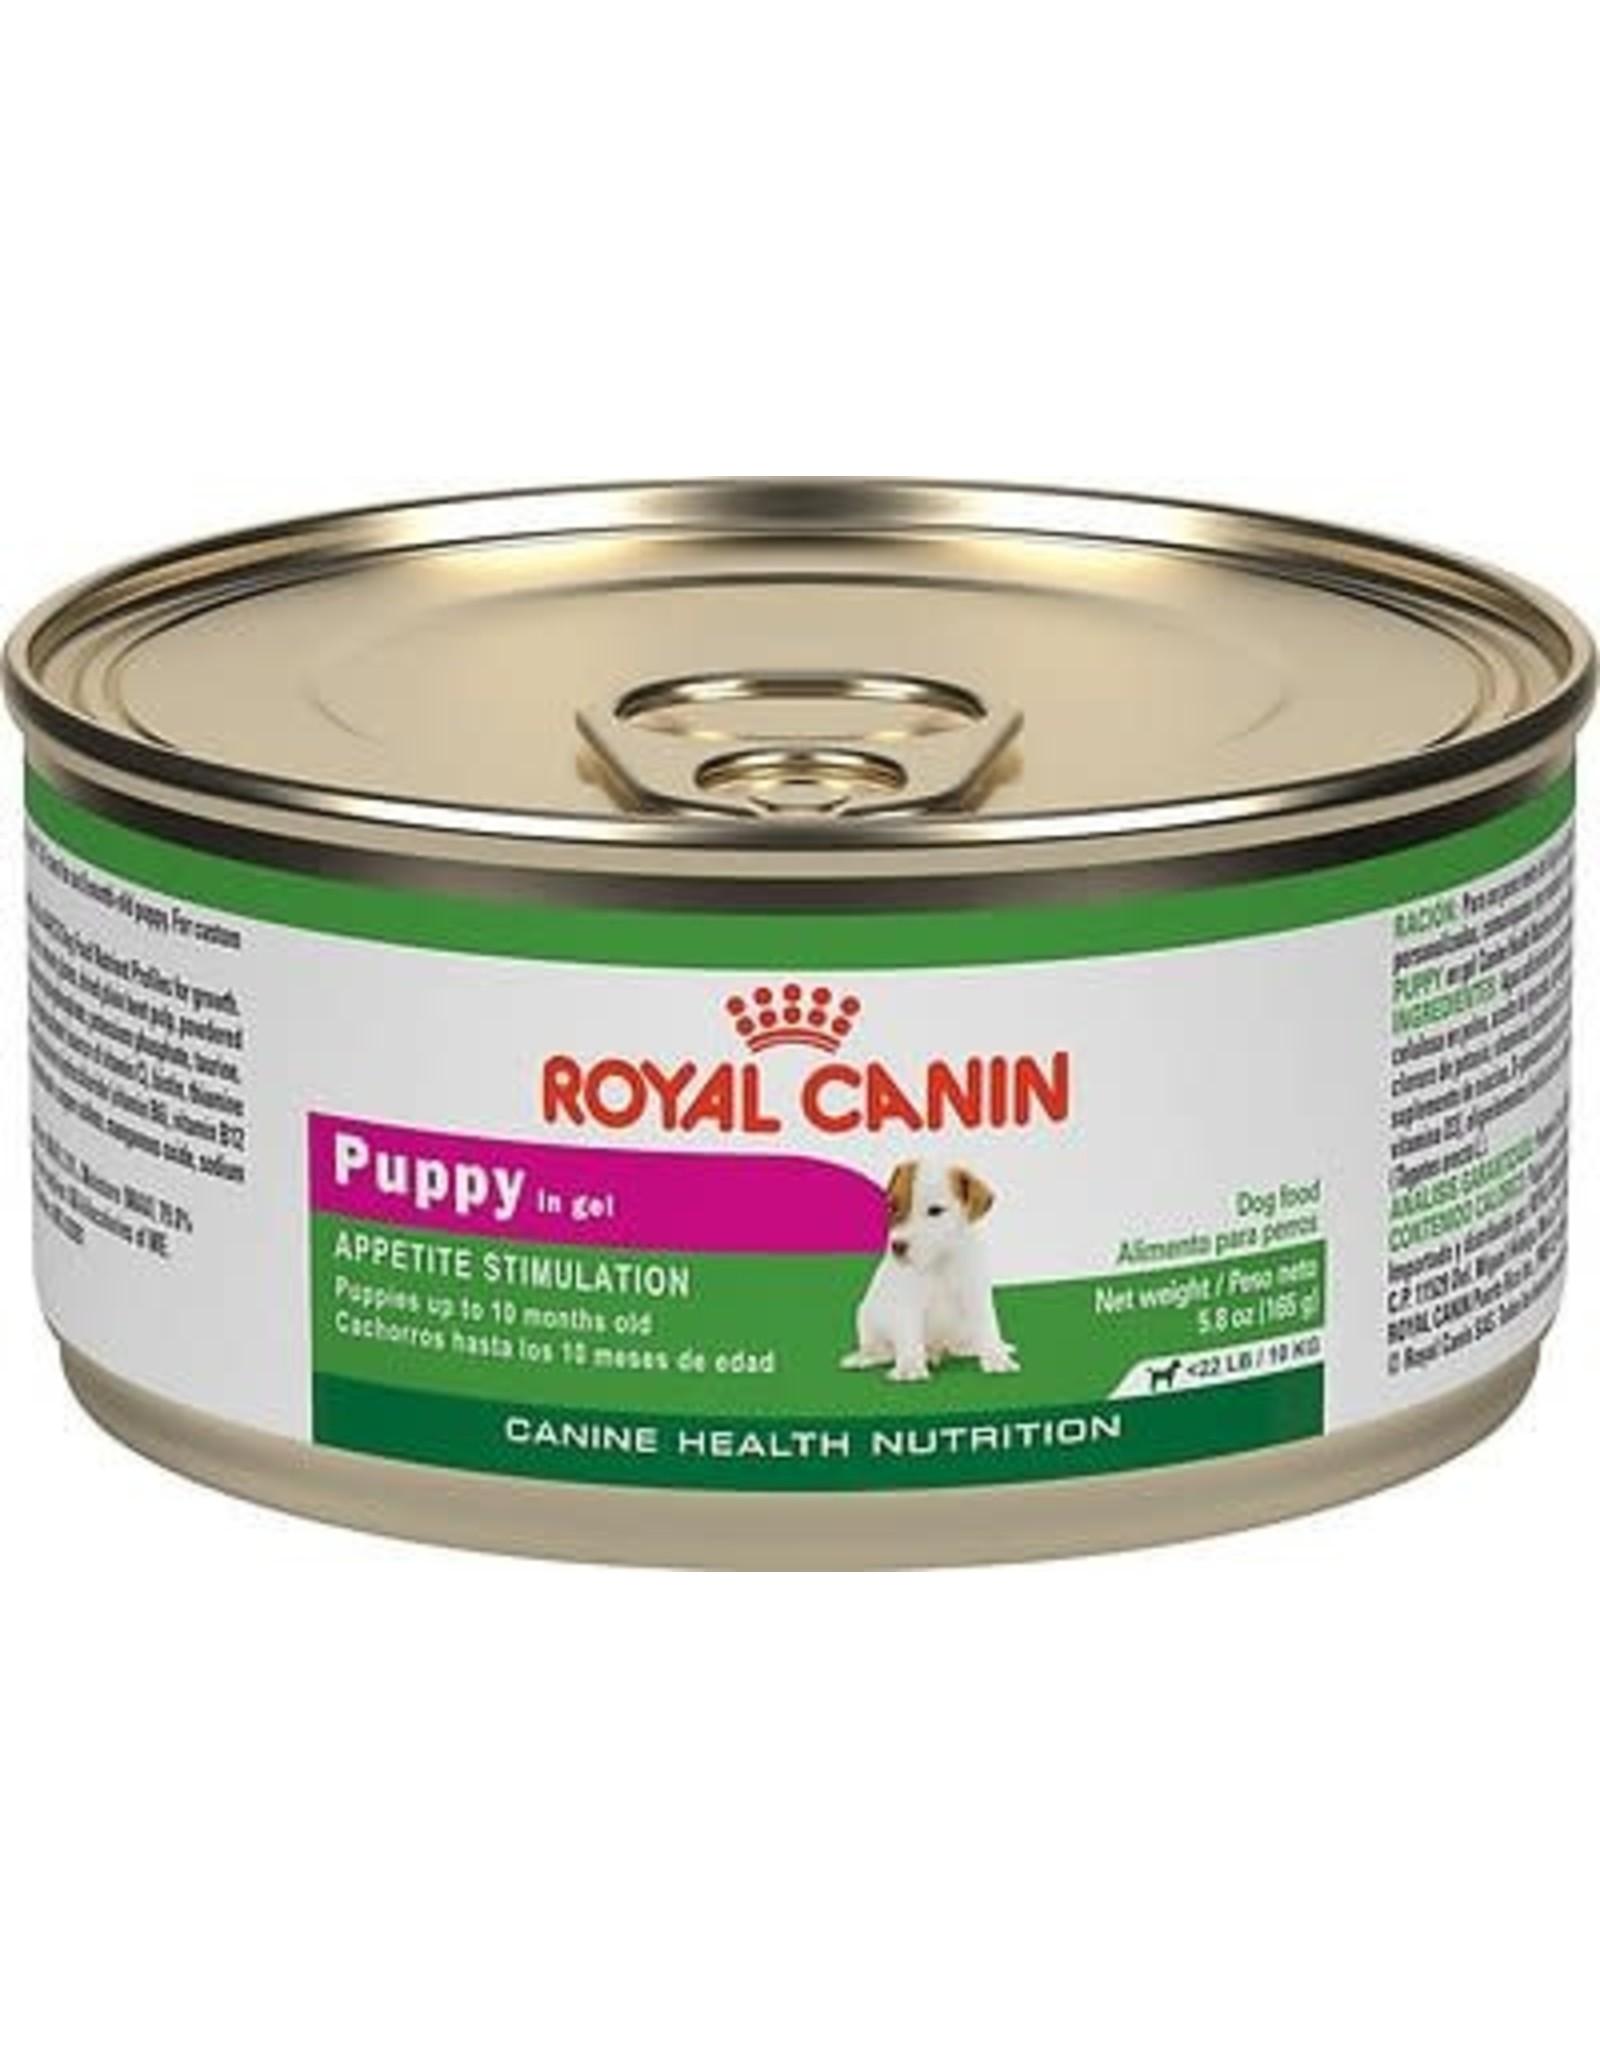 Royal Canin Royal Canin CHIOT PATE 24 x 165 GR